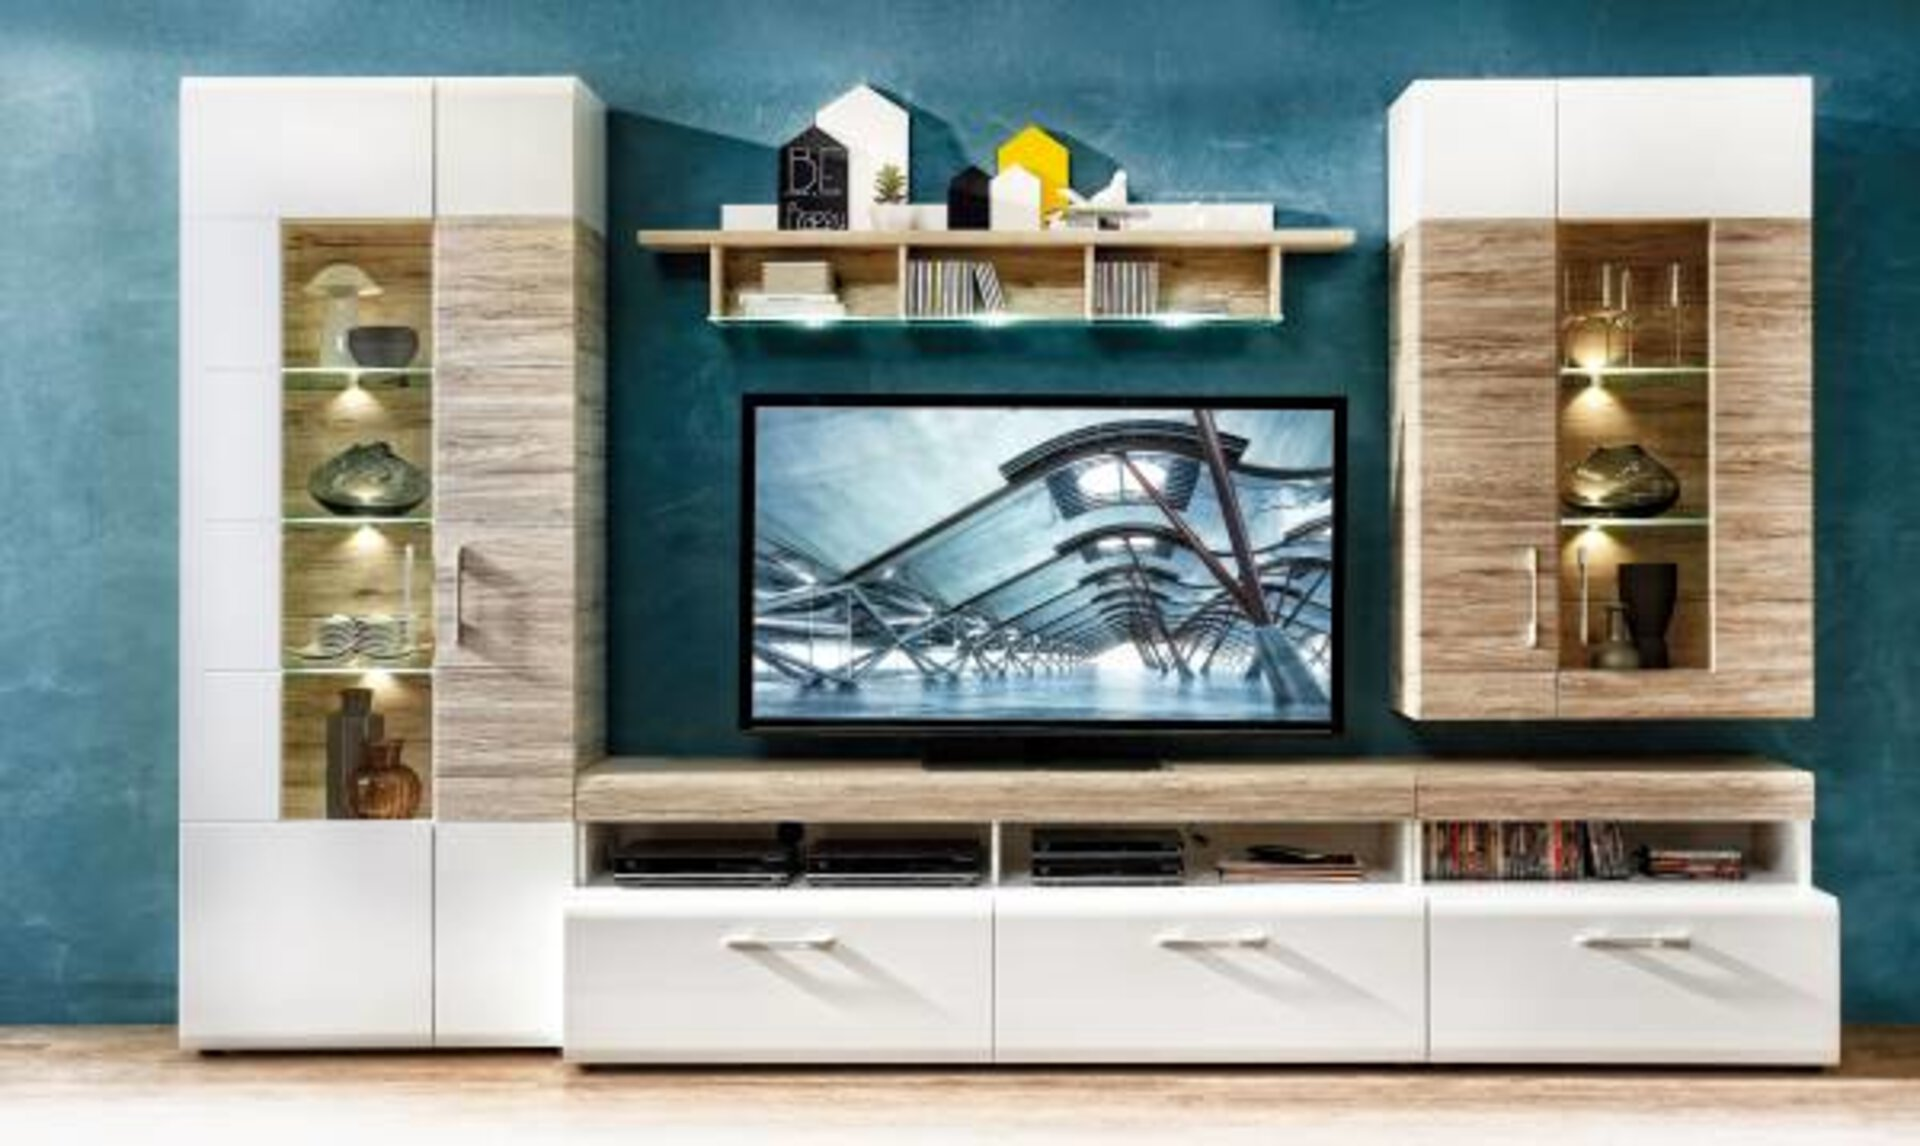 Wohnwand SPIRIT CELECT Holzwerkstoff mehrfarbig 1 x 2 x 3 cm